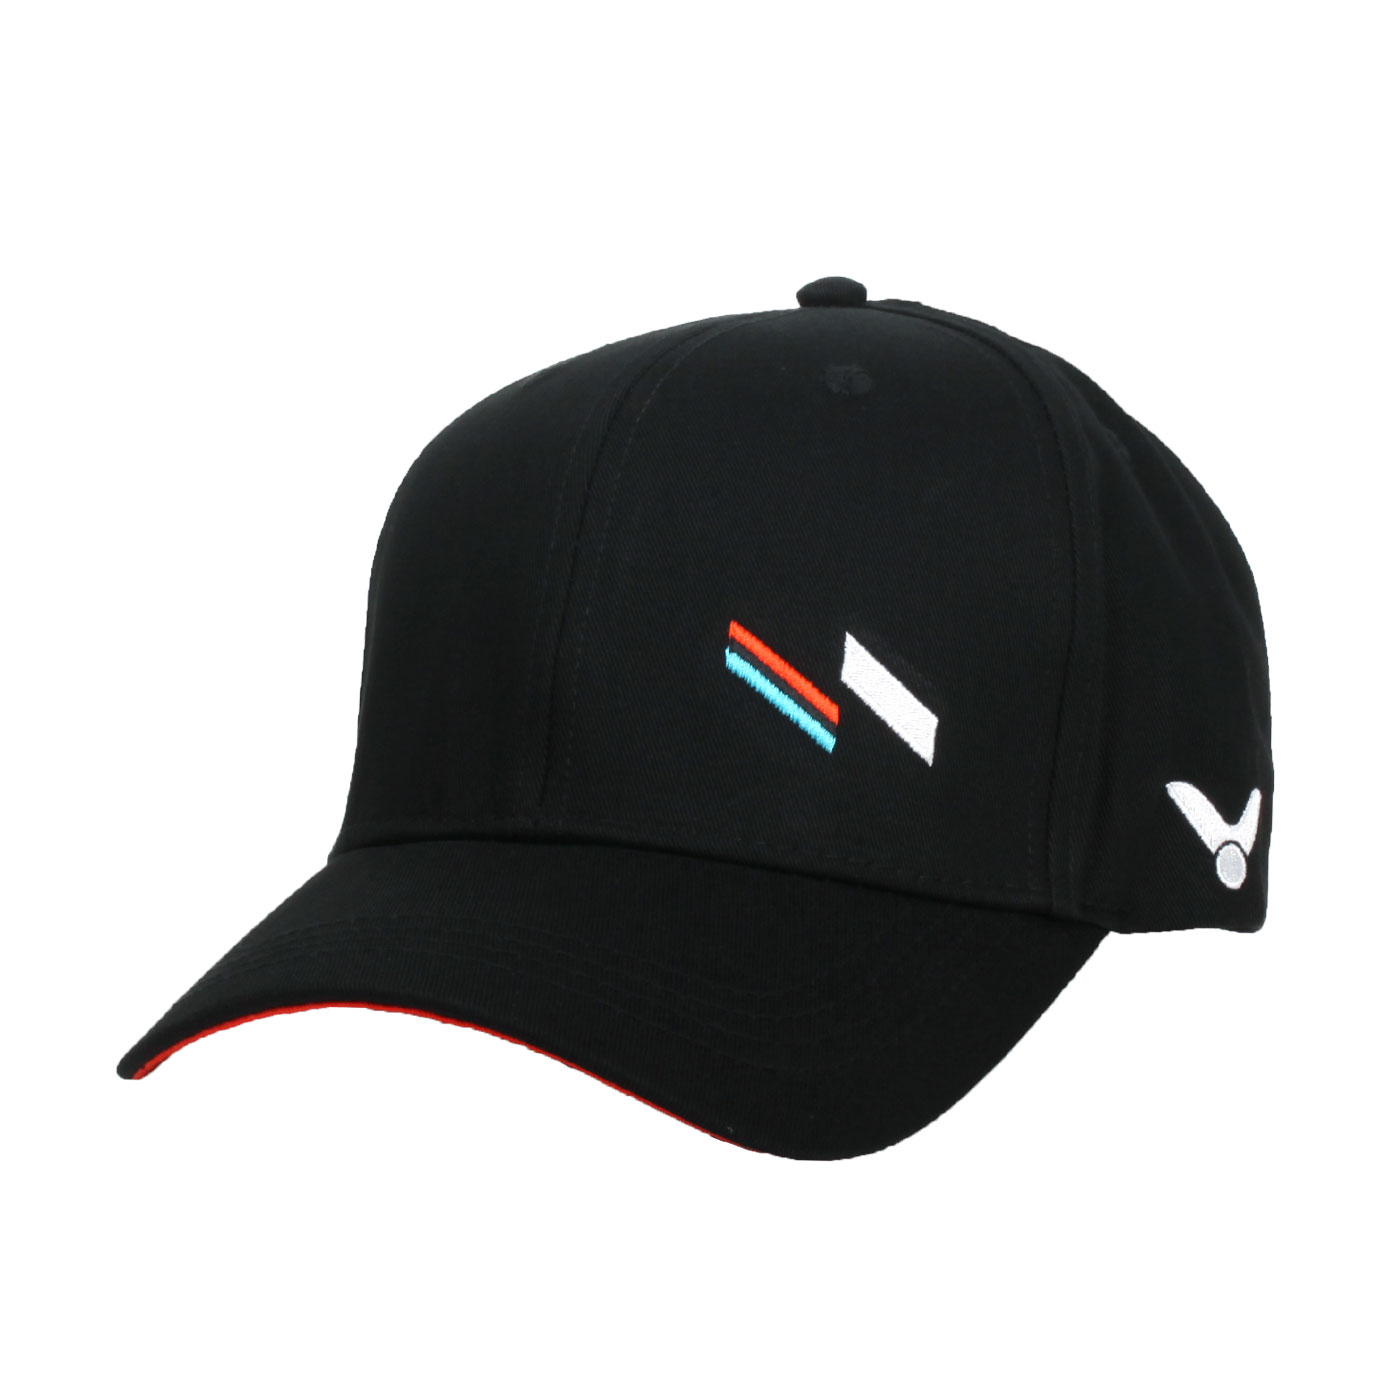 VICTOR 運動帽 C-VC211 - 黑白藍橘